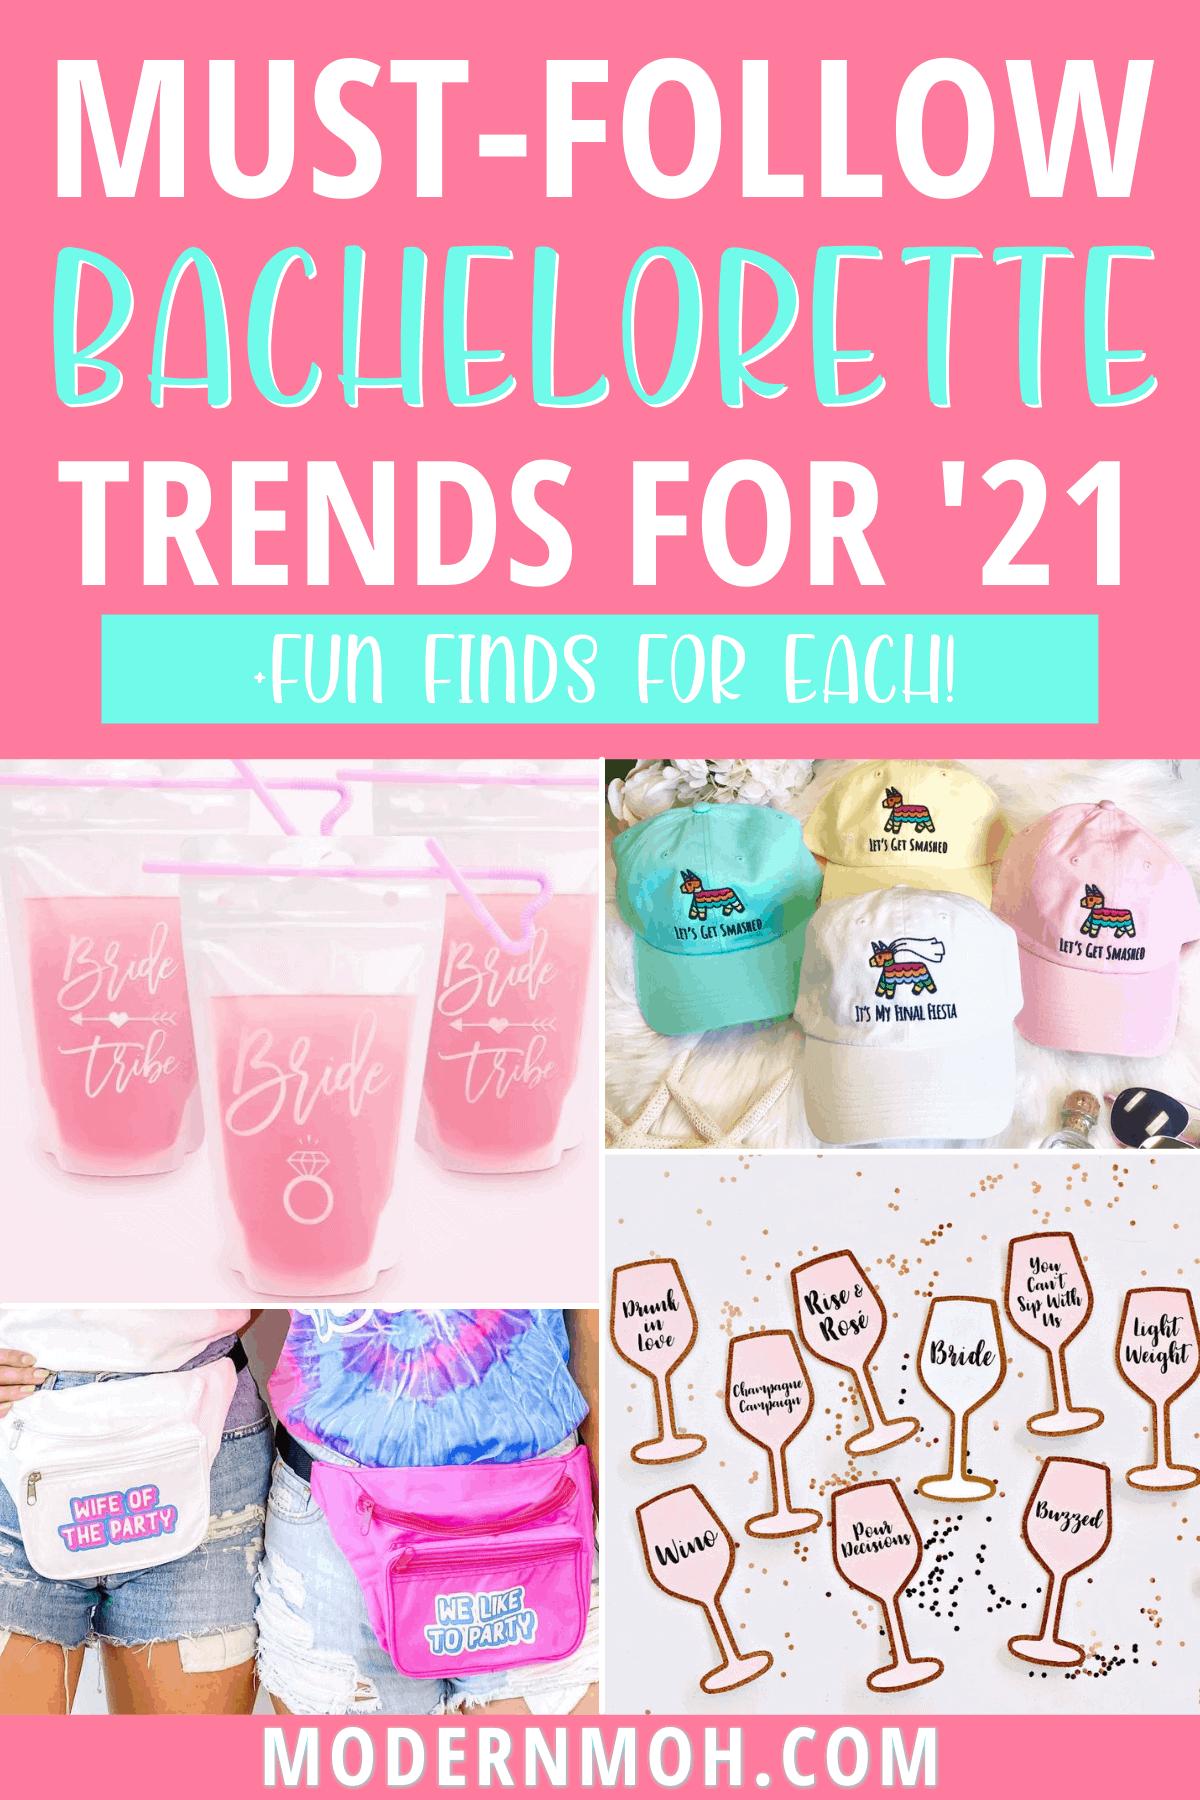 4 Fresh Bachelorette Party Trends